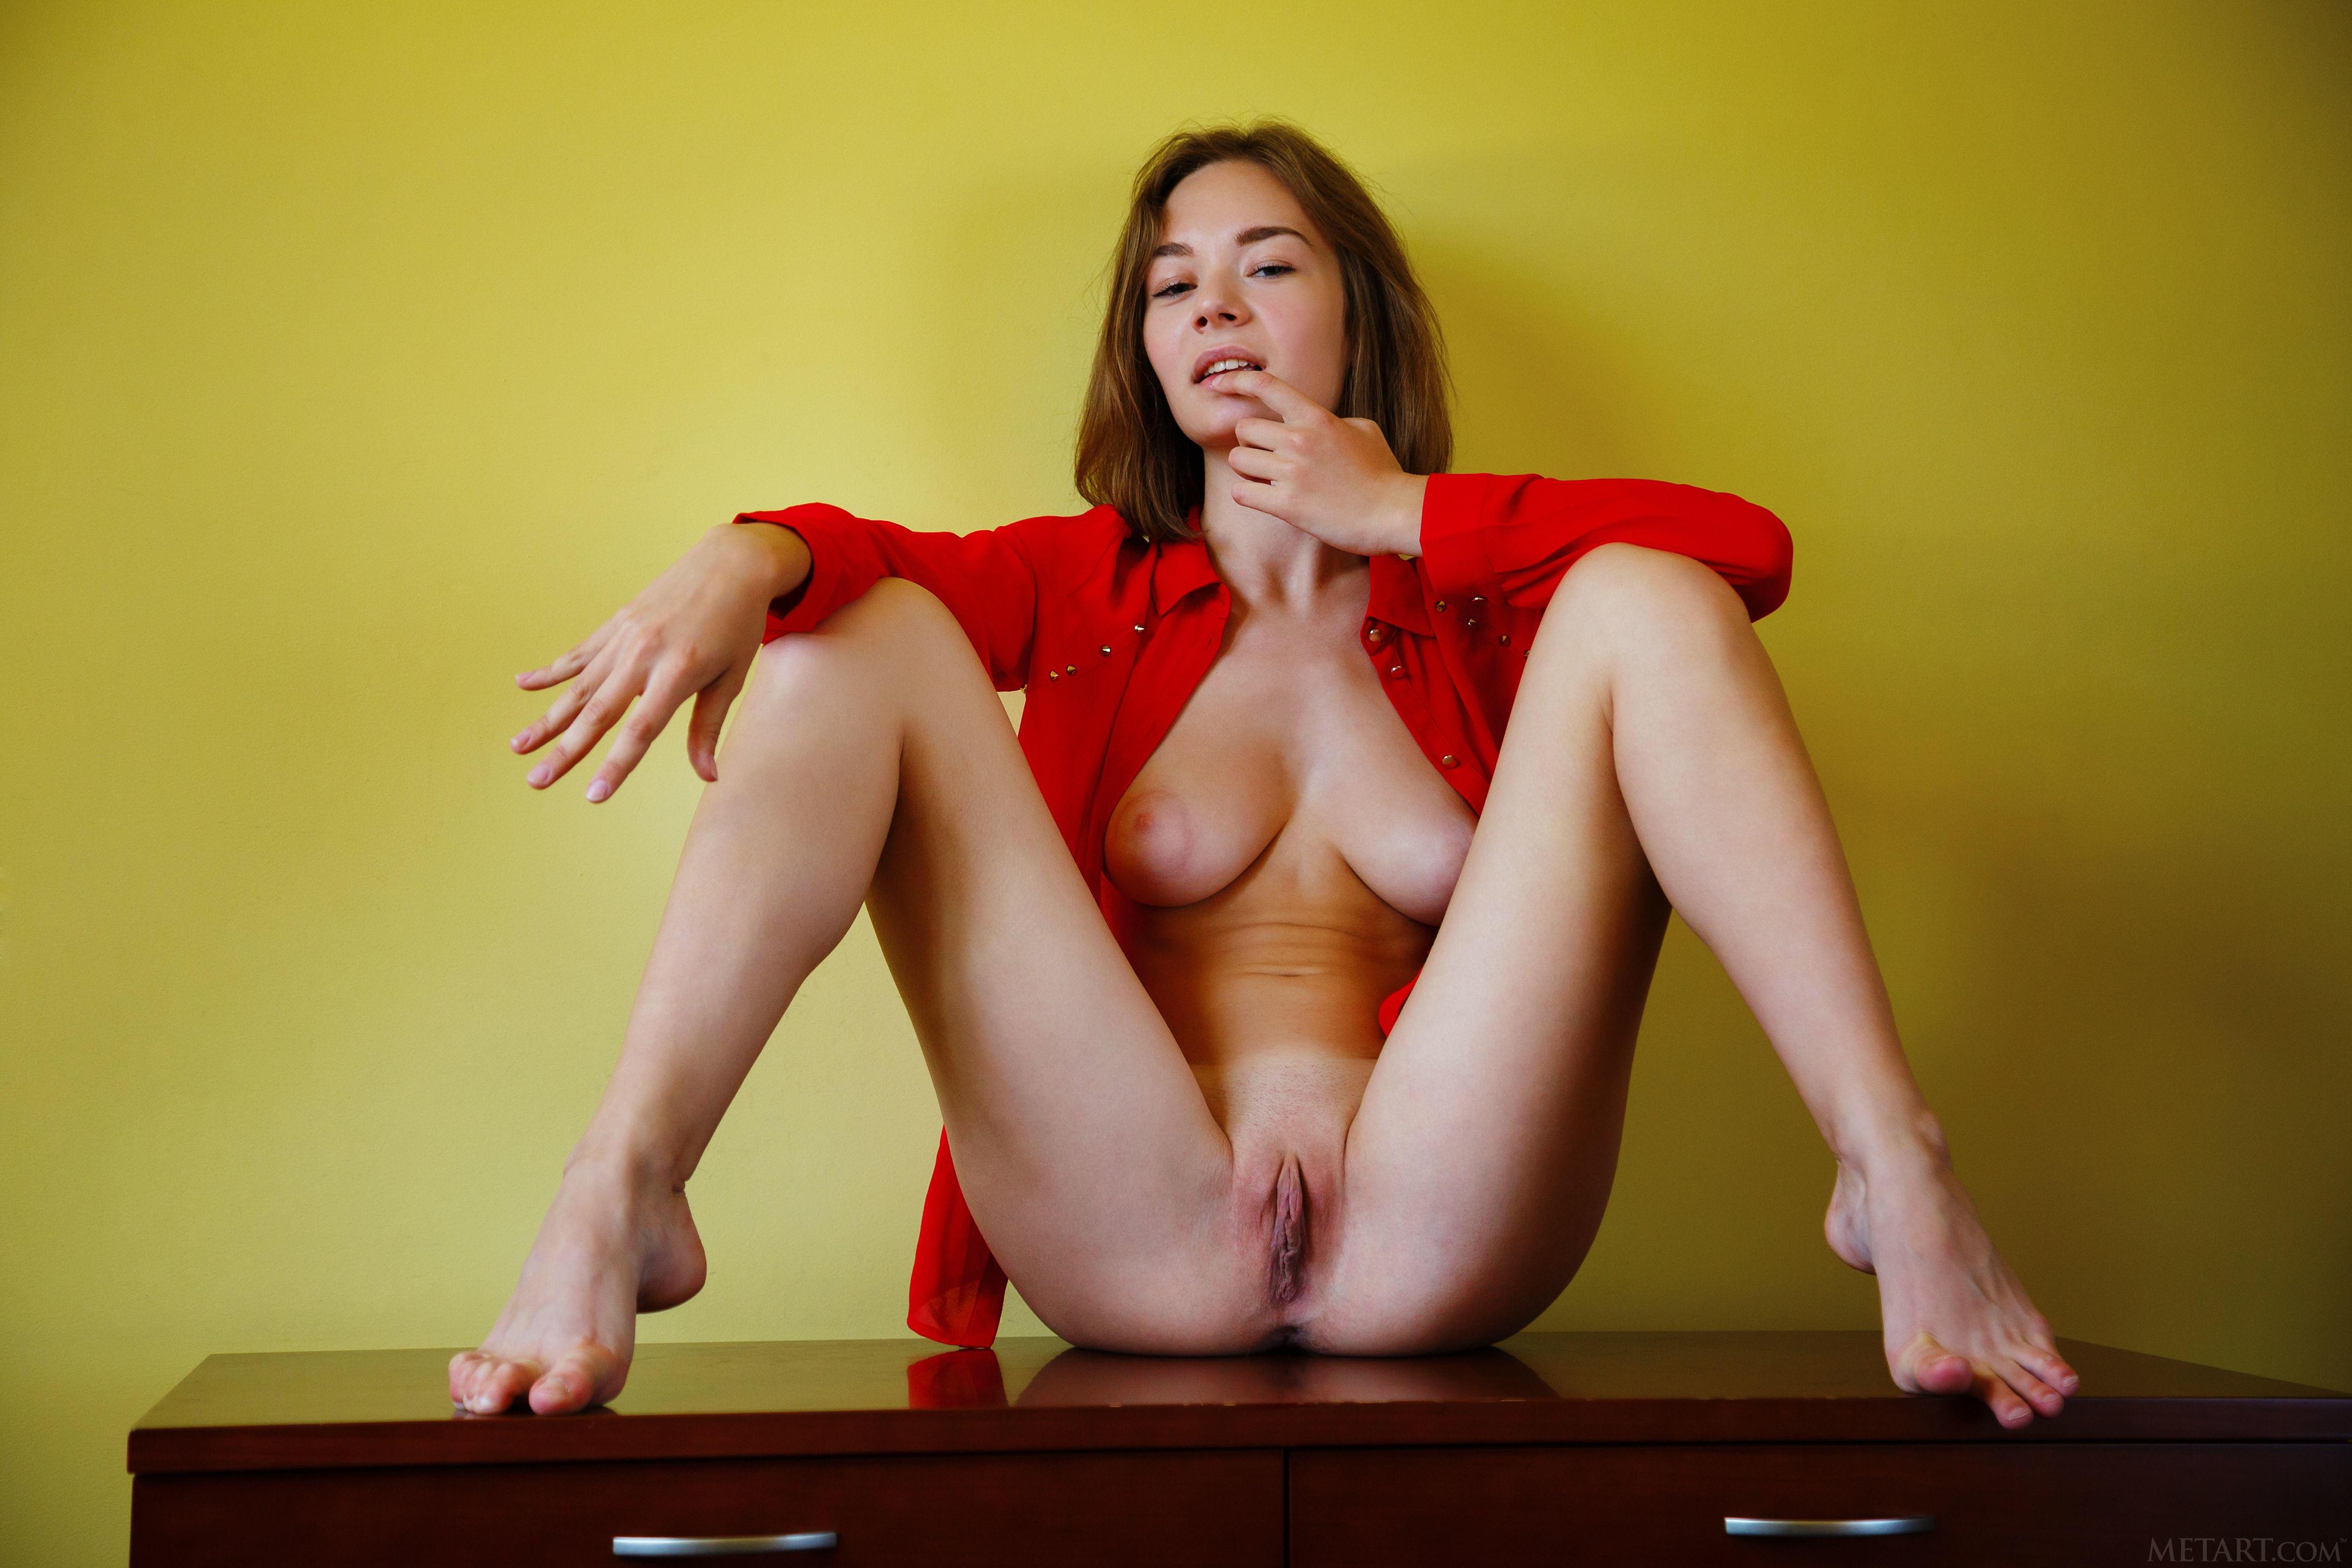 обои Selina, красотка, голая, голая девушка картинки фото